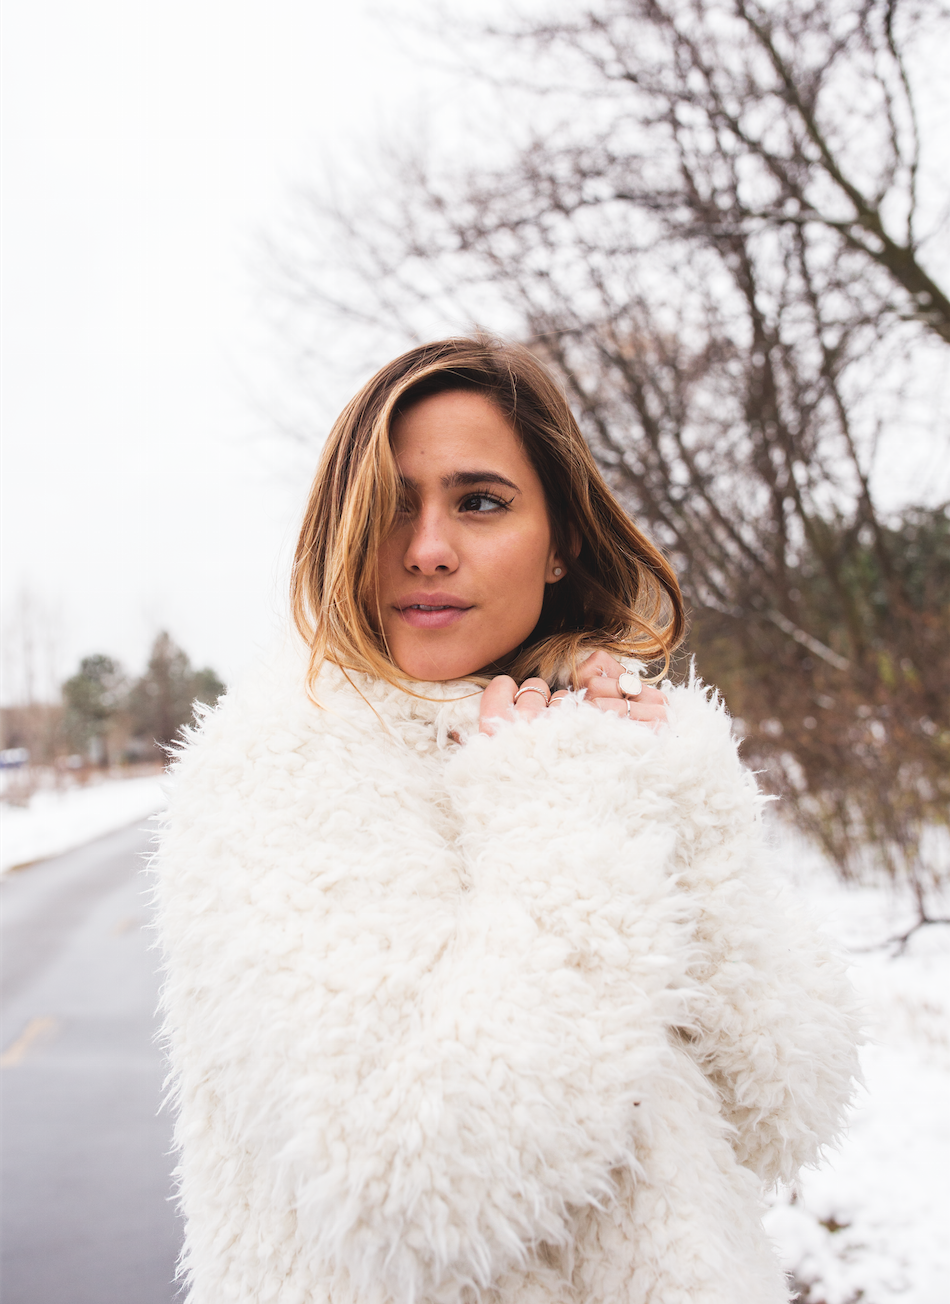 Sami | Model, Treefort Magazine Creative Director